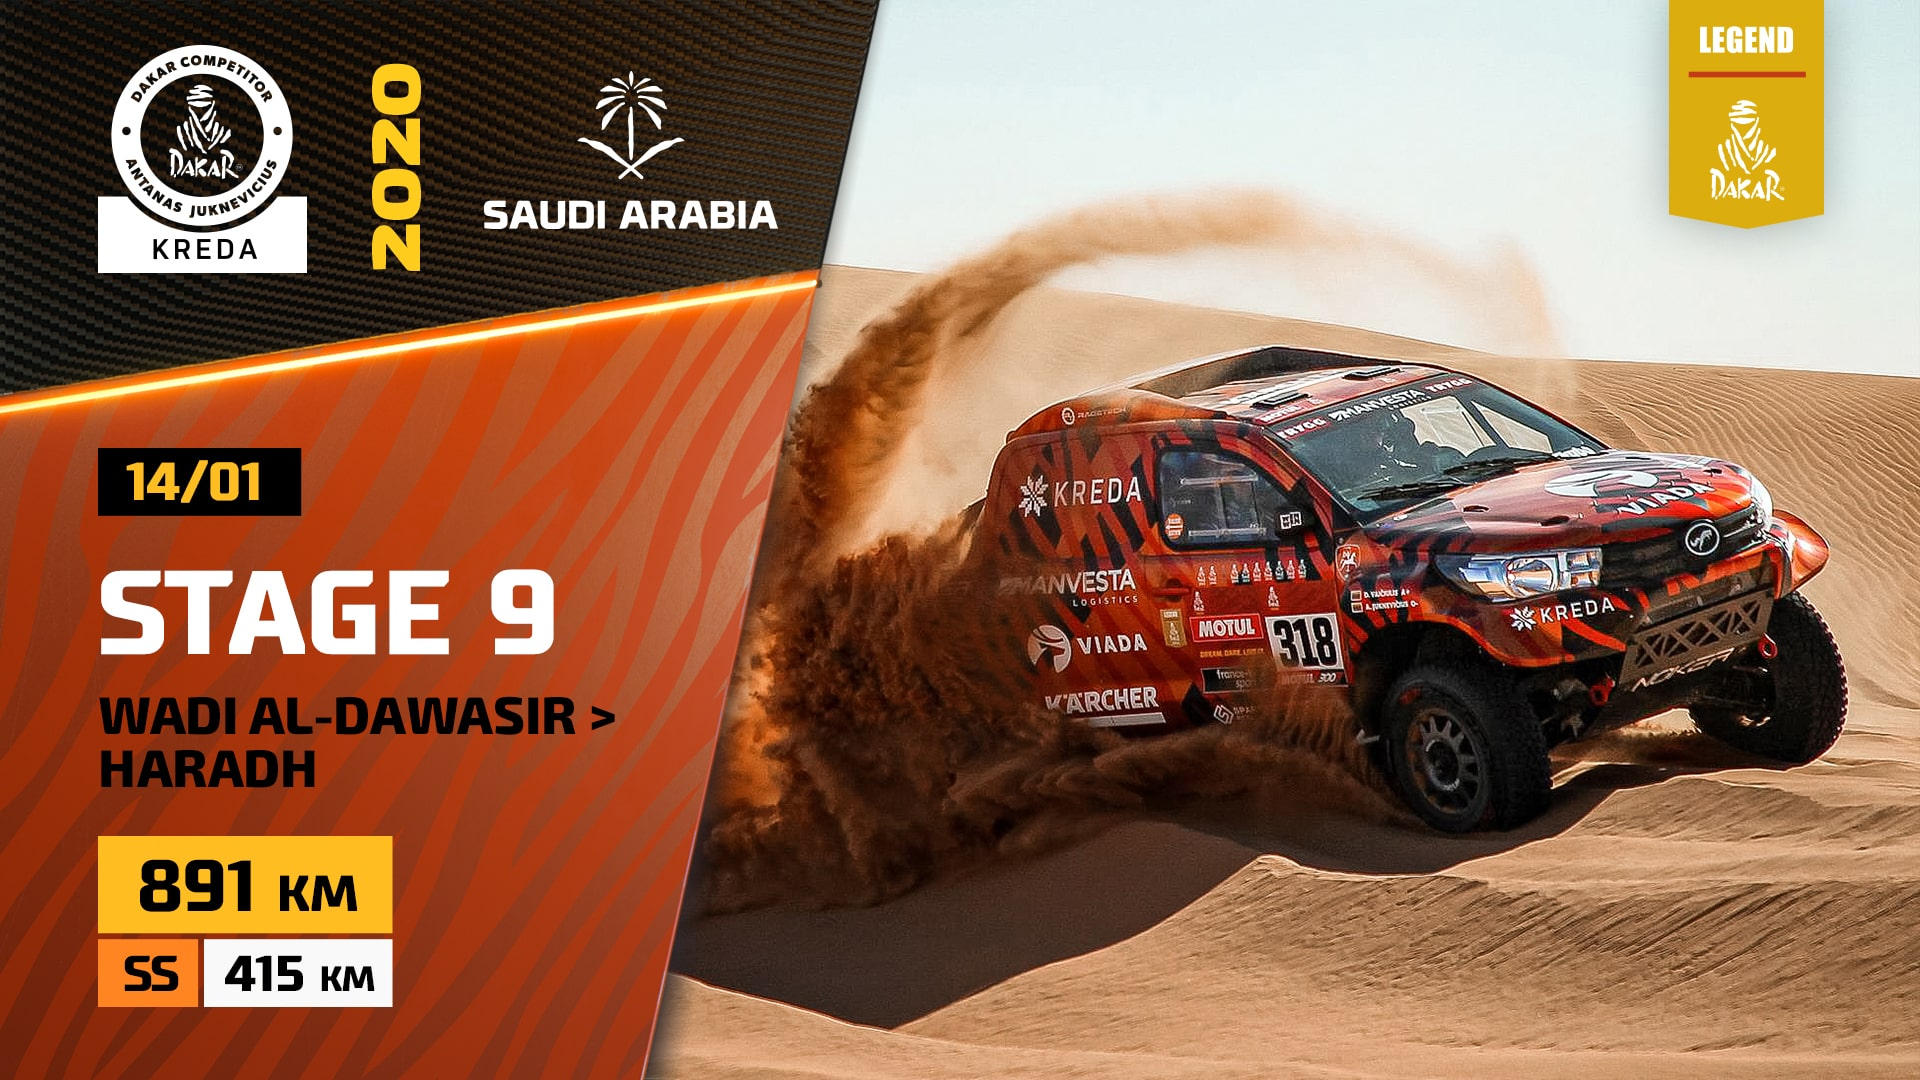 Dakar Rally 2020. Stage 9 Highlights Wadi Al-Dawasir – Haradh in Saudi Arabia